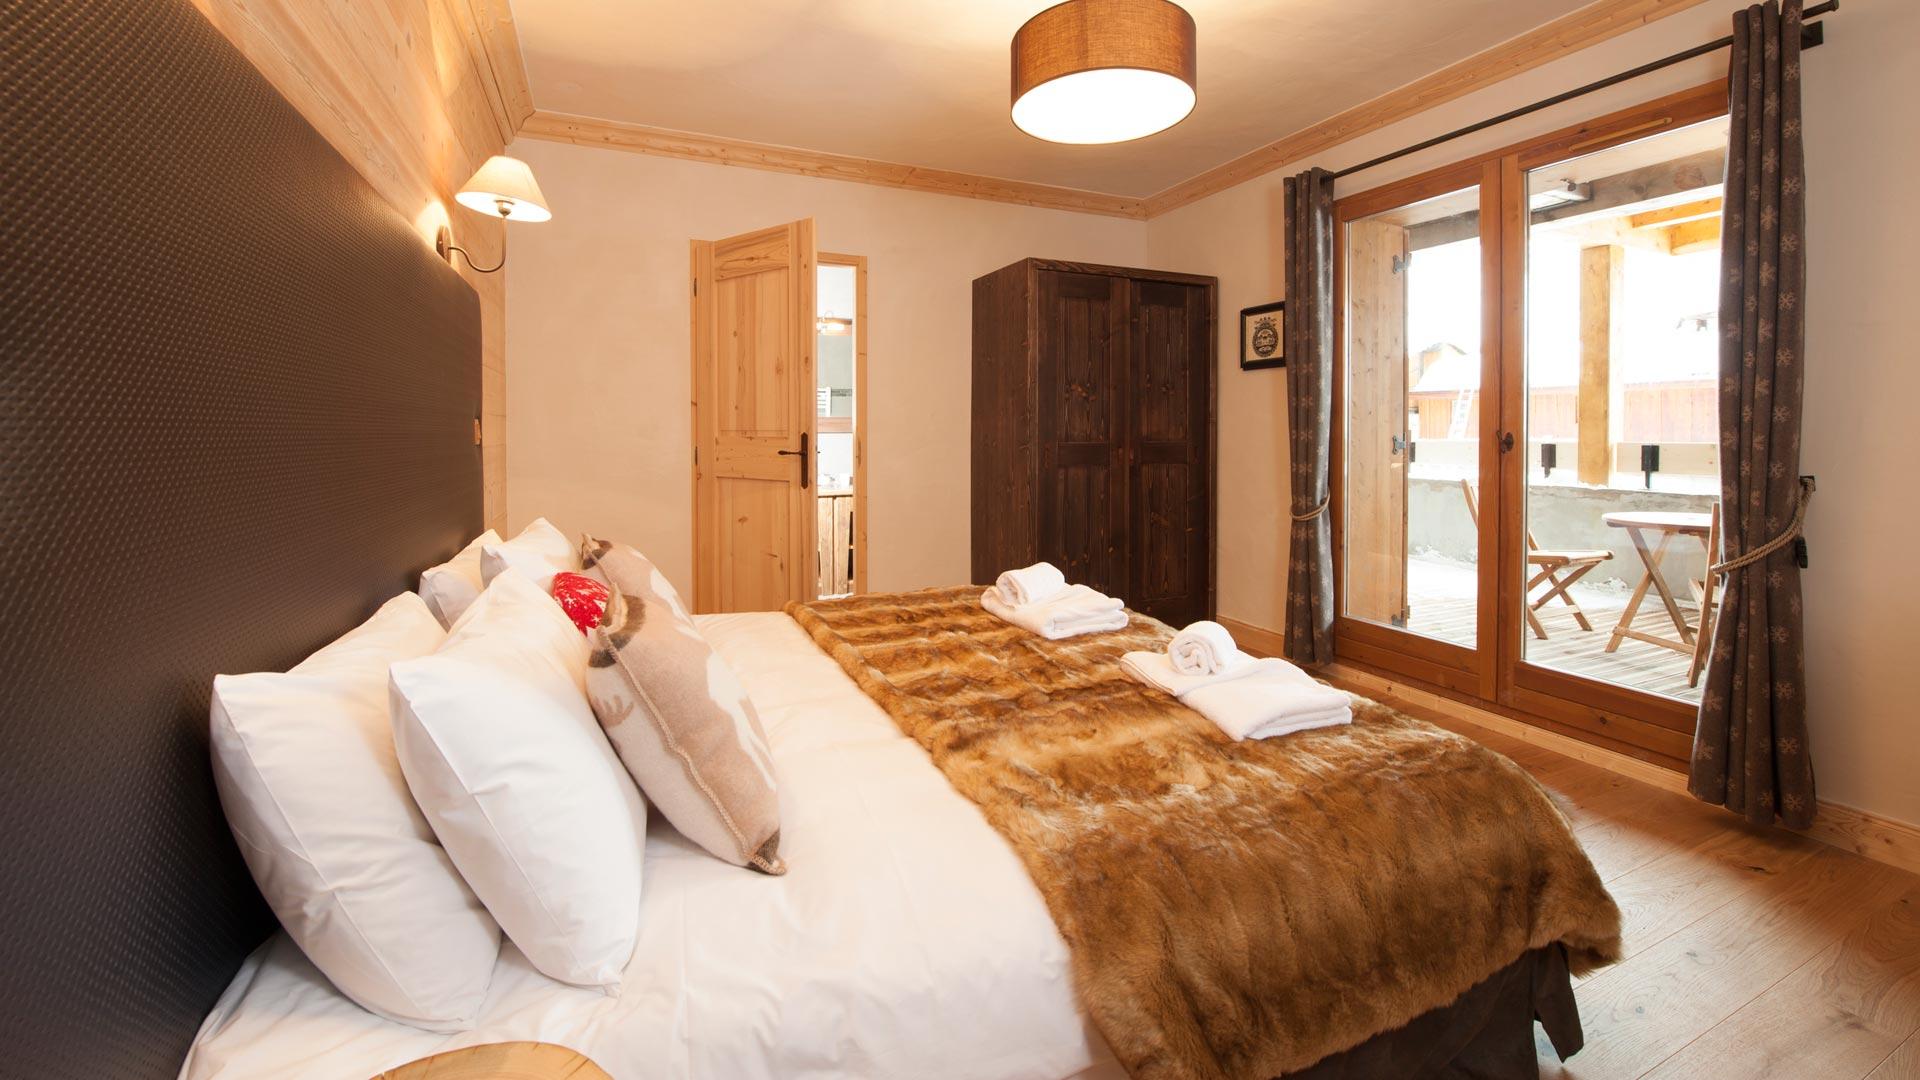 Double/Twin Bedroom in Grand Solliet Chalet in Ste Foy